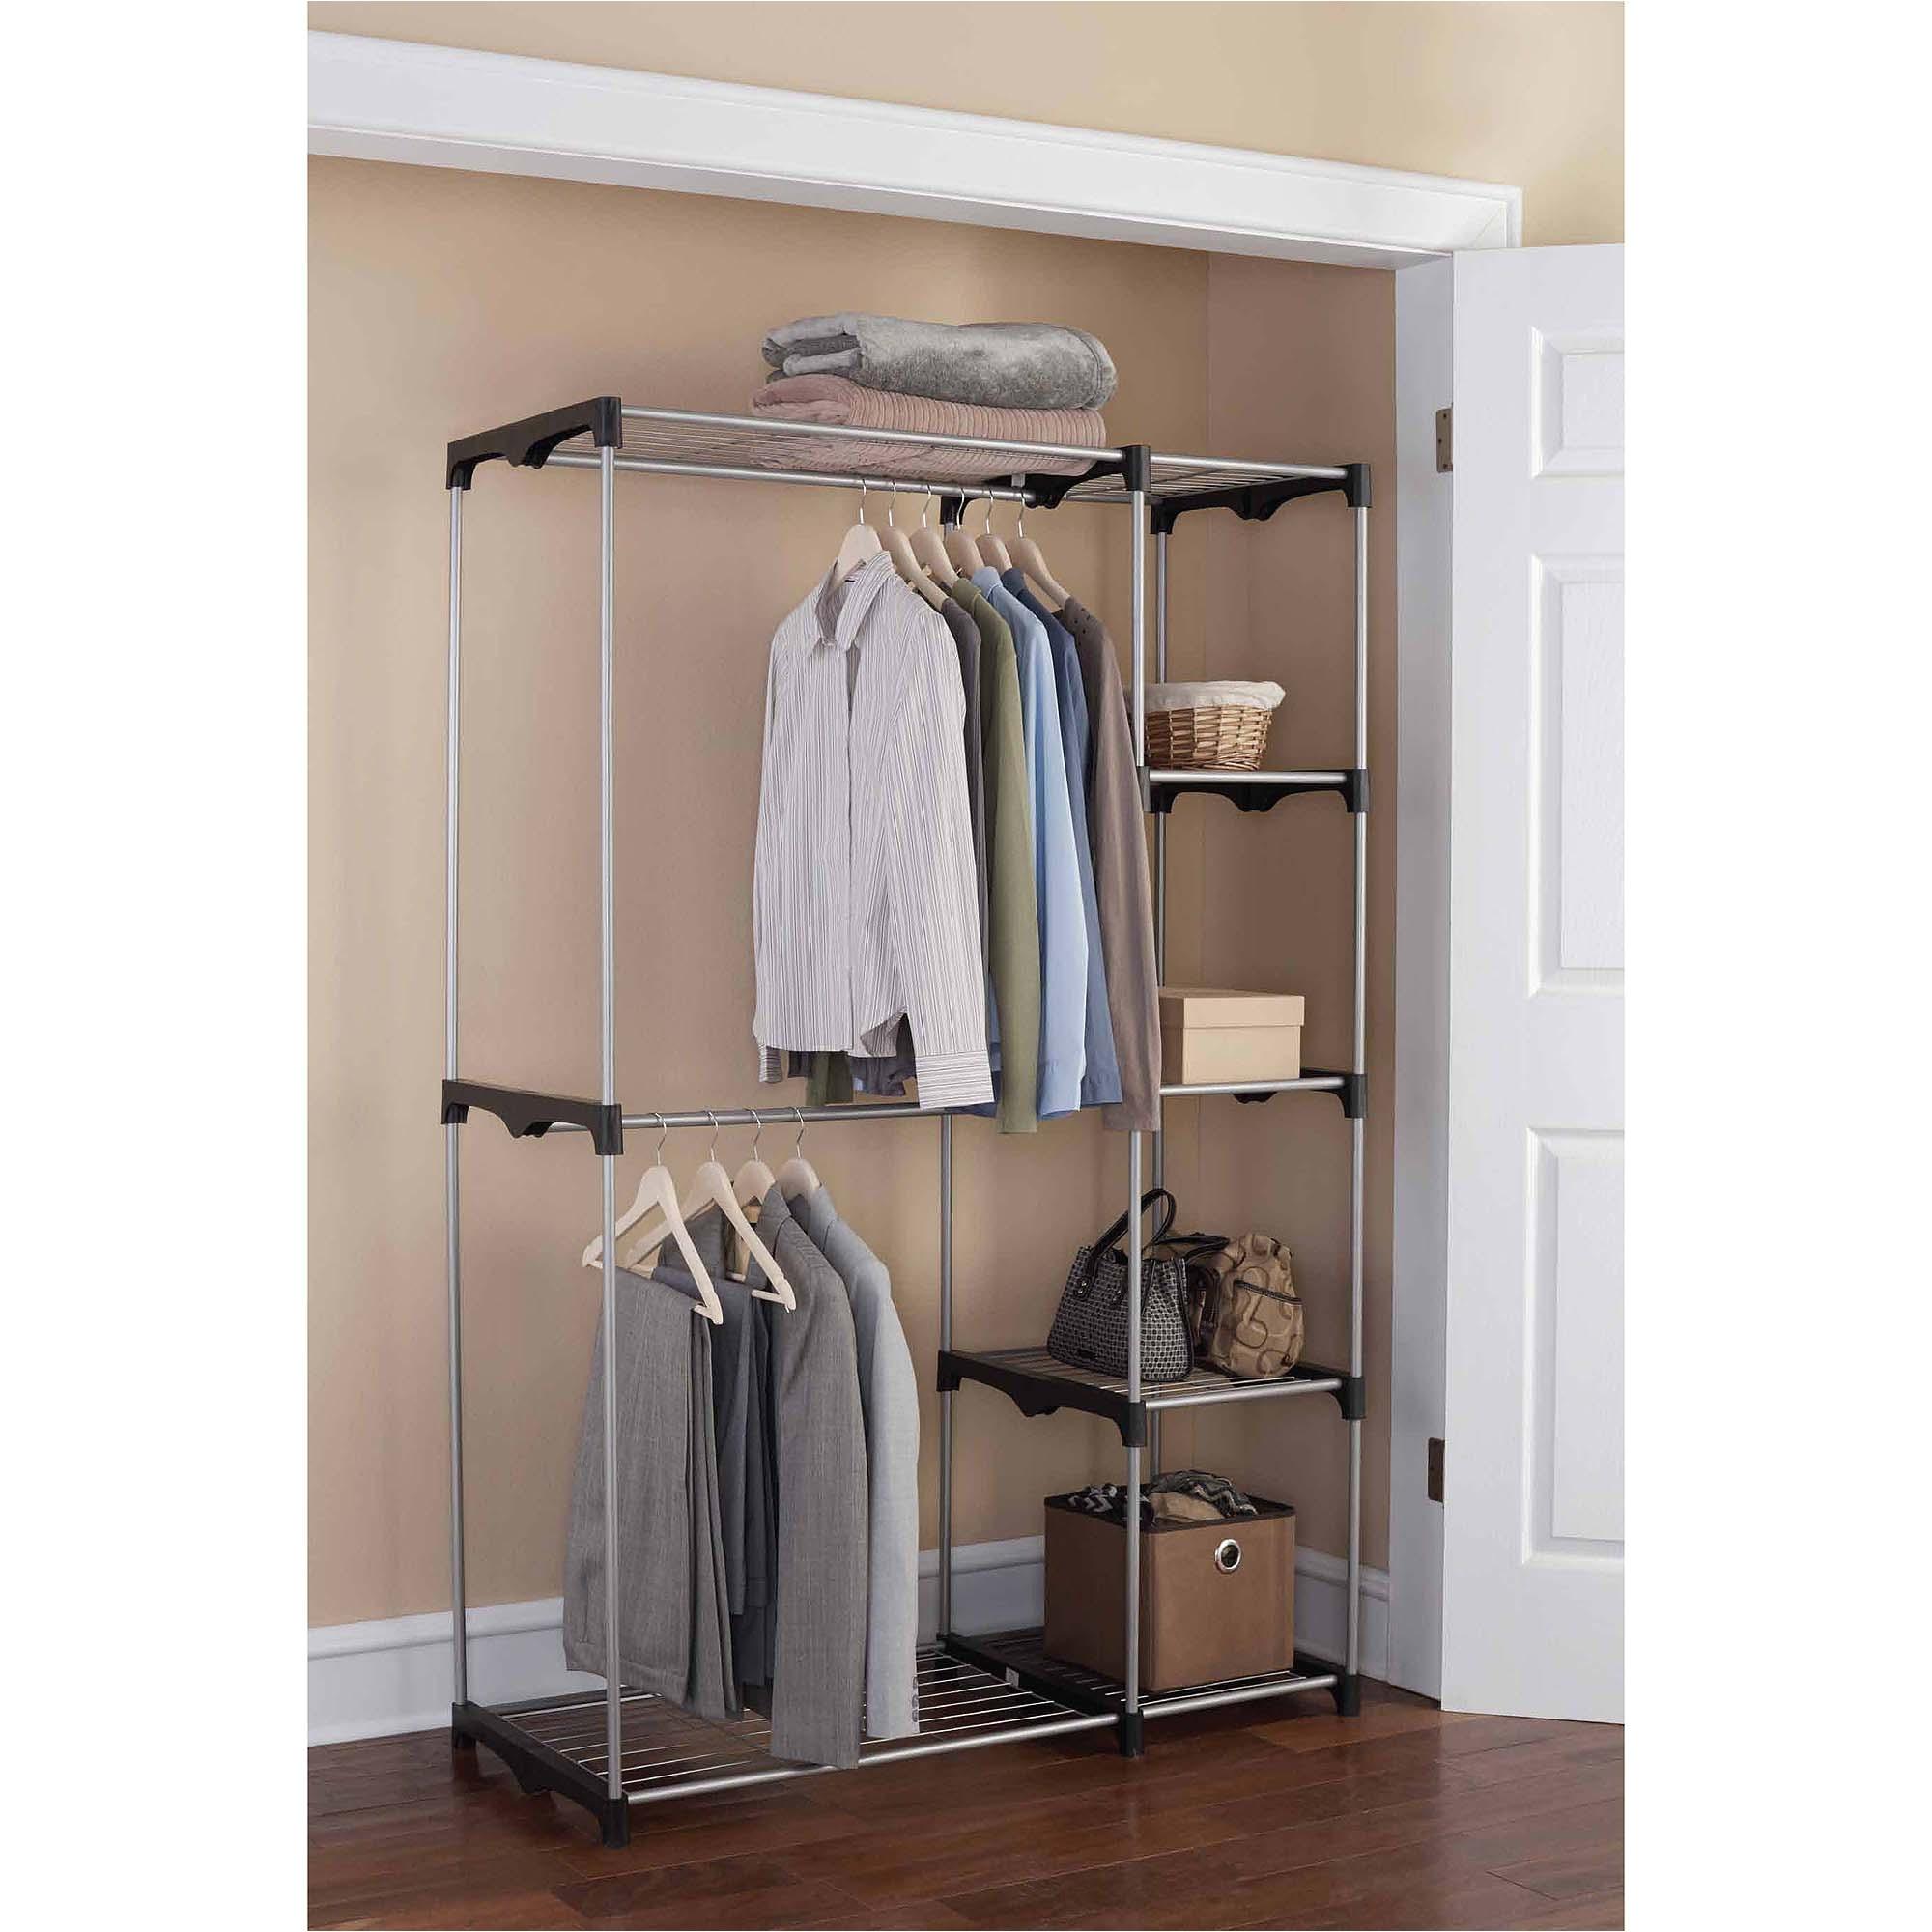 Clothing Drying Rack Walmart Wire Closet Shelving